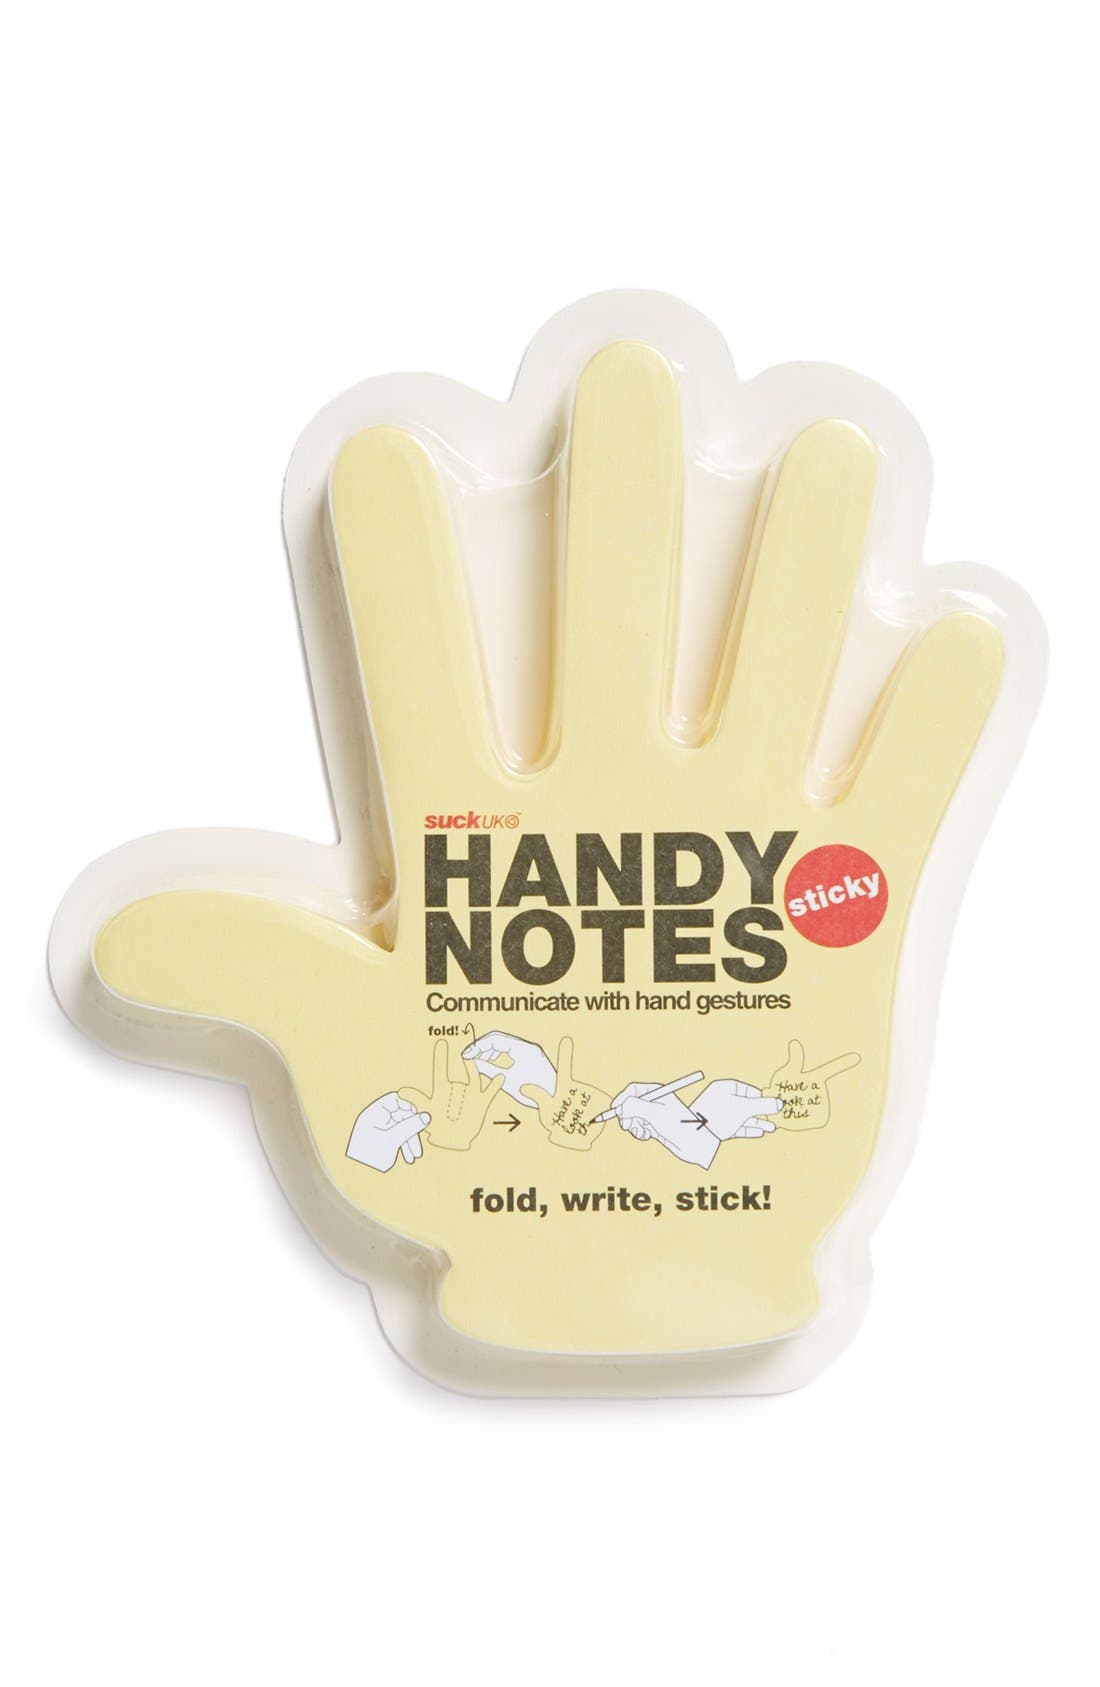 Alternate Image 1 Selected - Suck UK 'Handy Notes' Sticky Notepad